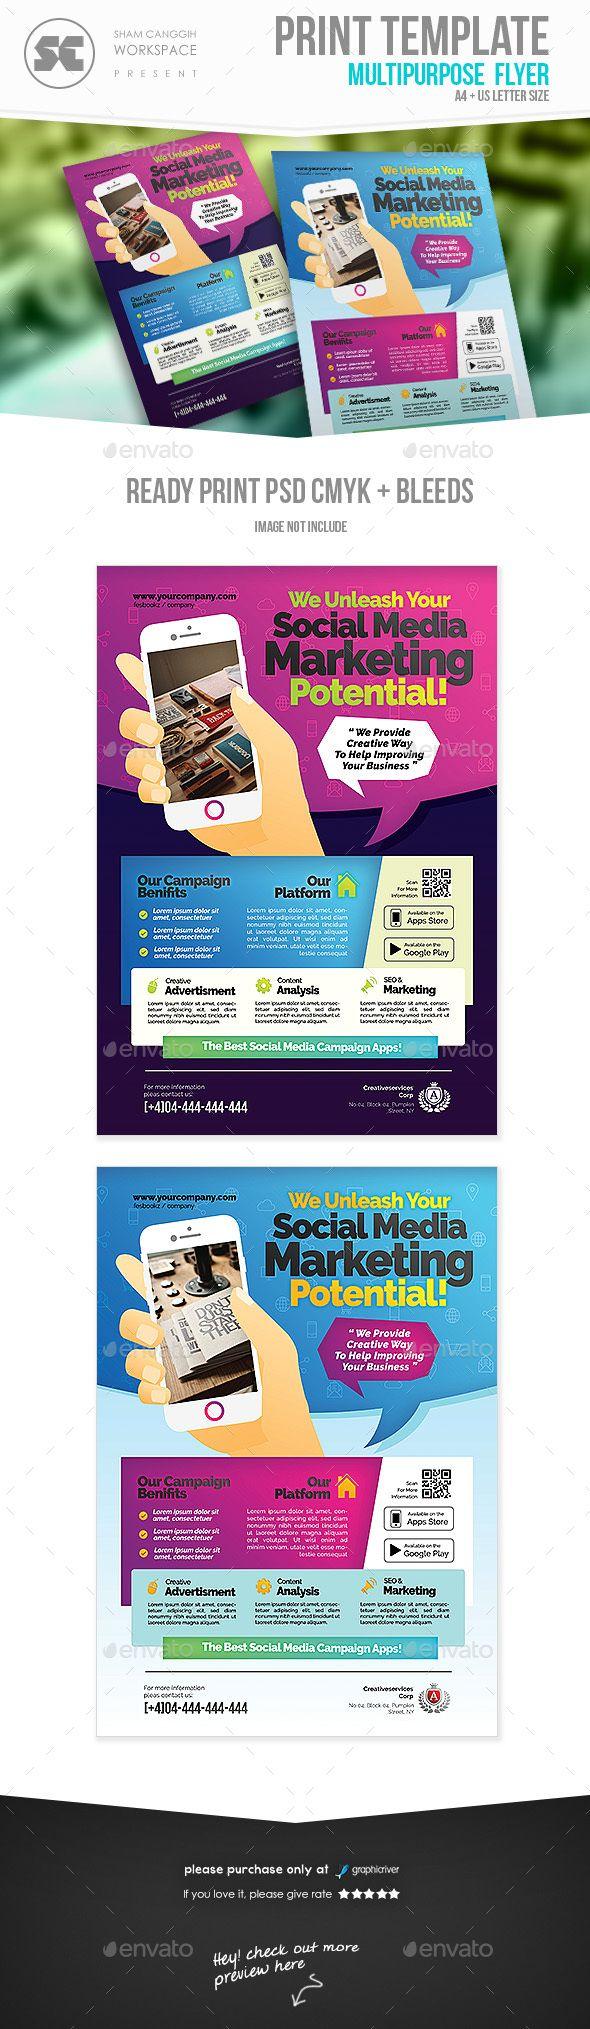 Best 25+ Marketing flyers ideas on Pinterest